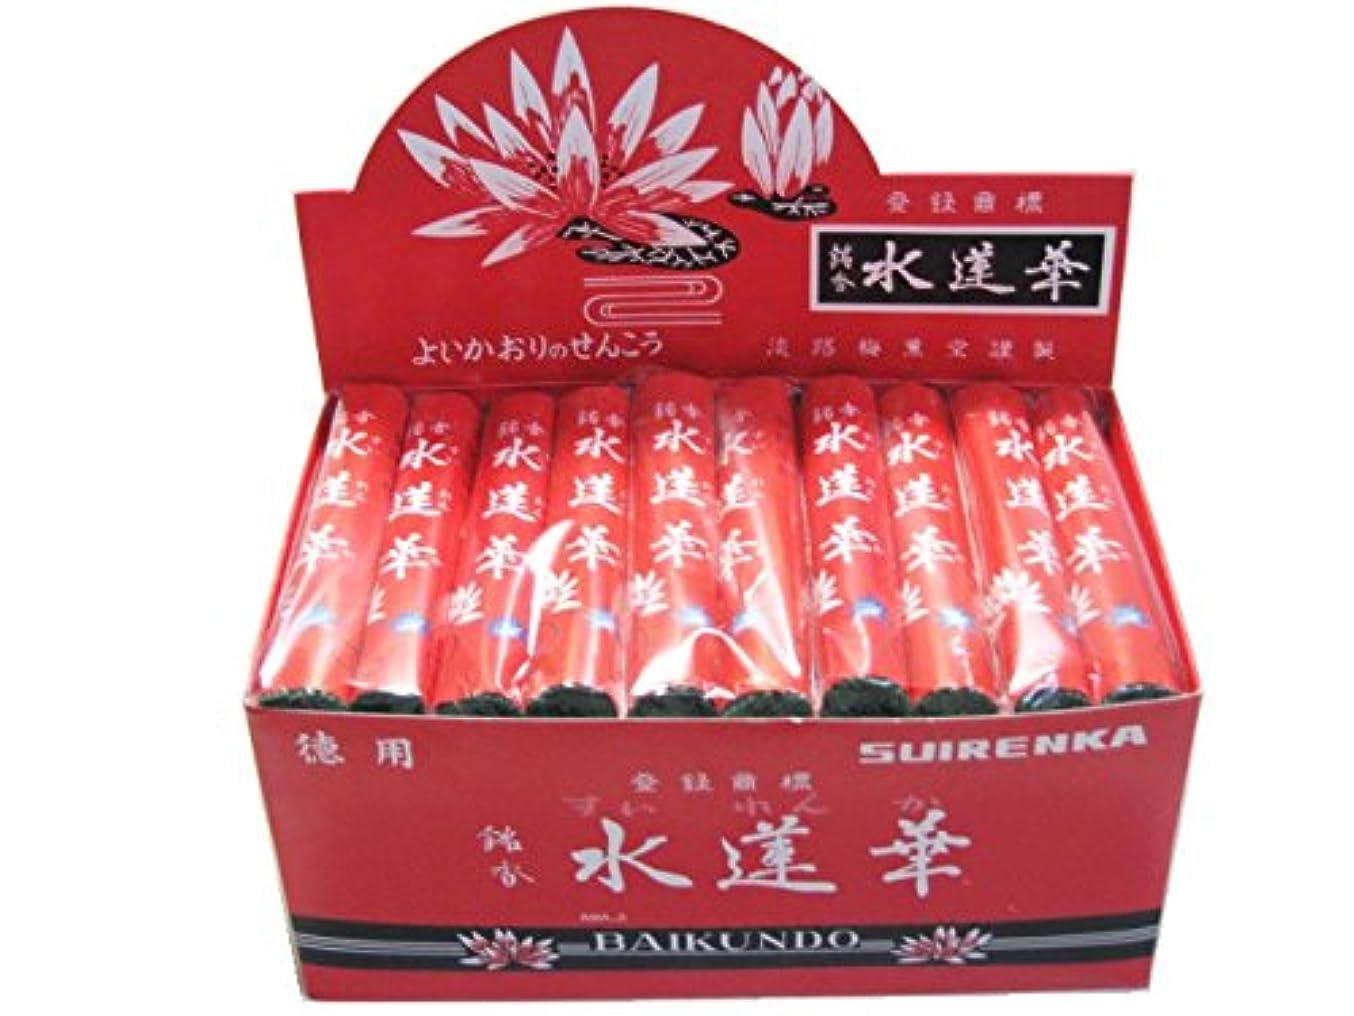 淡路梅薫堂のお線香 徳用水蓮華 大把 2p × 25袋×12箱 #300